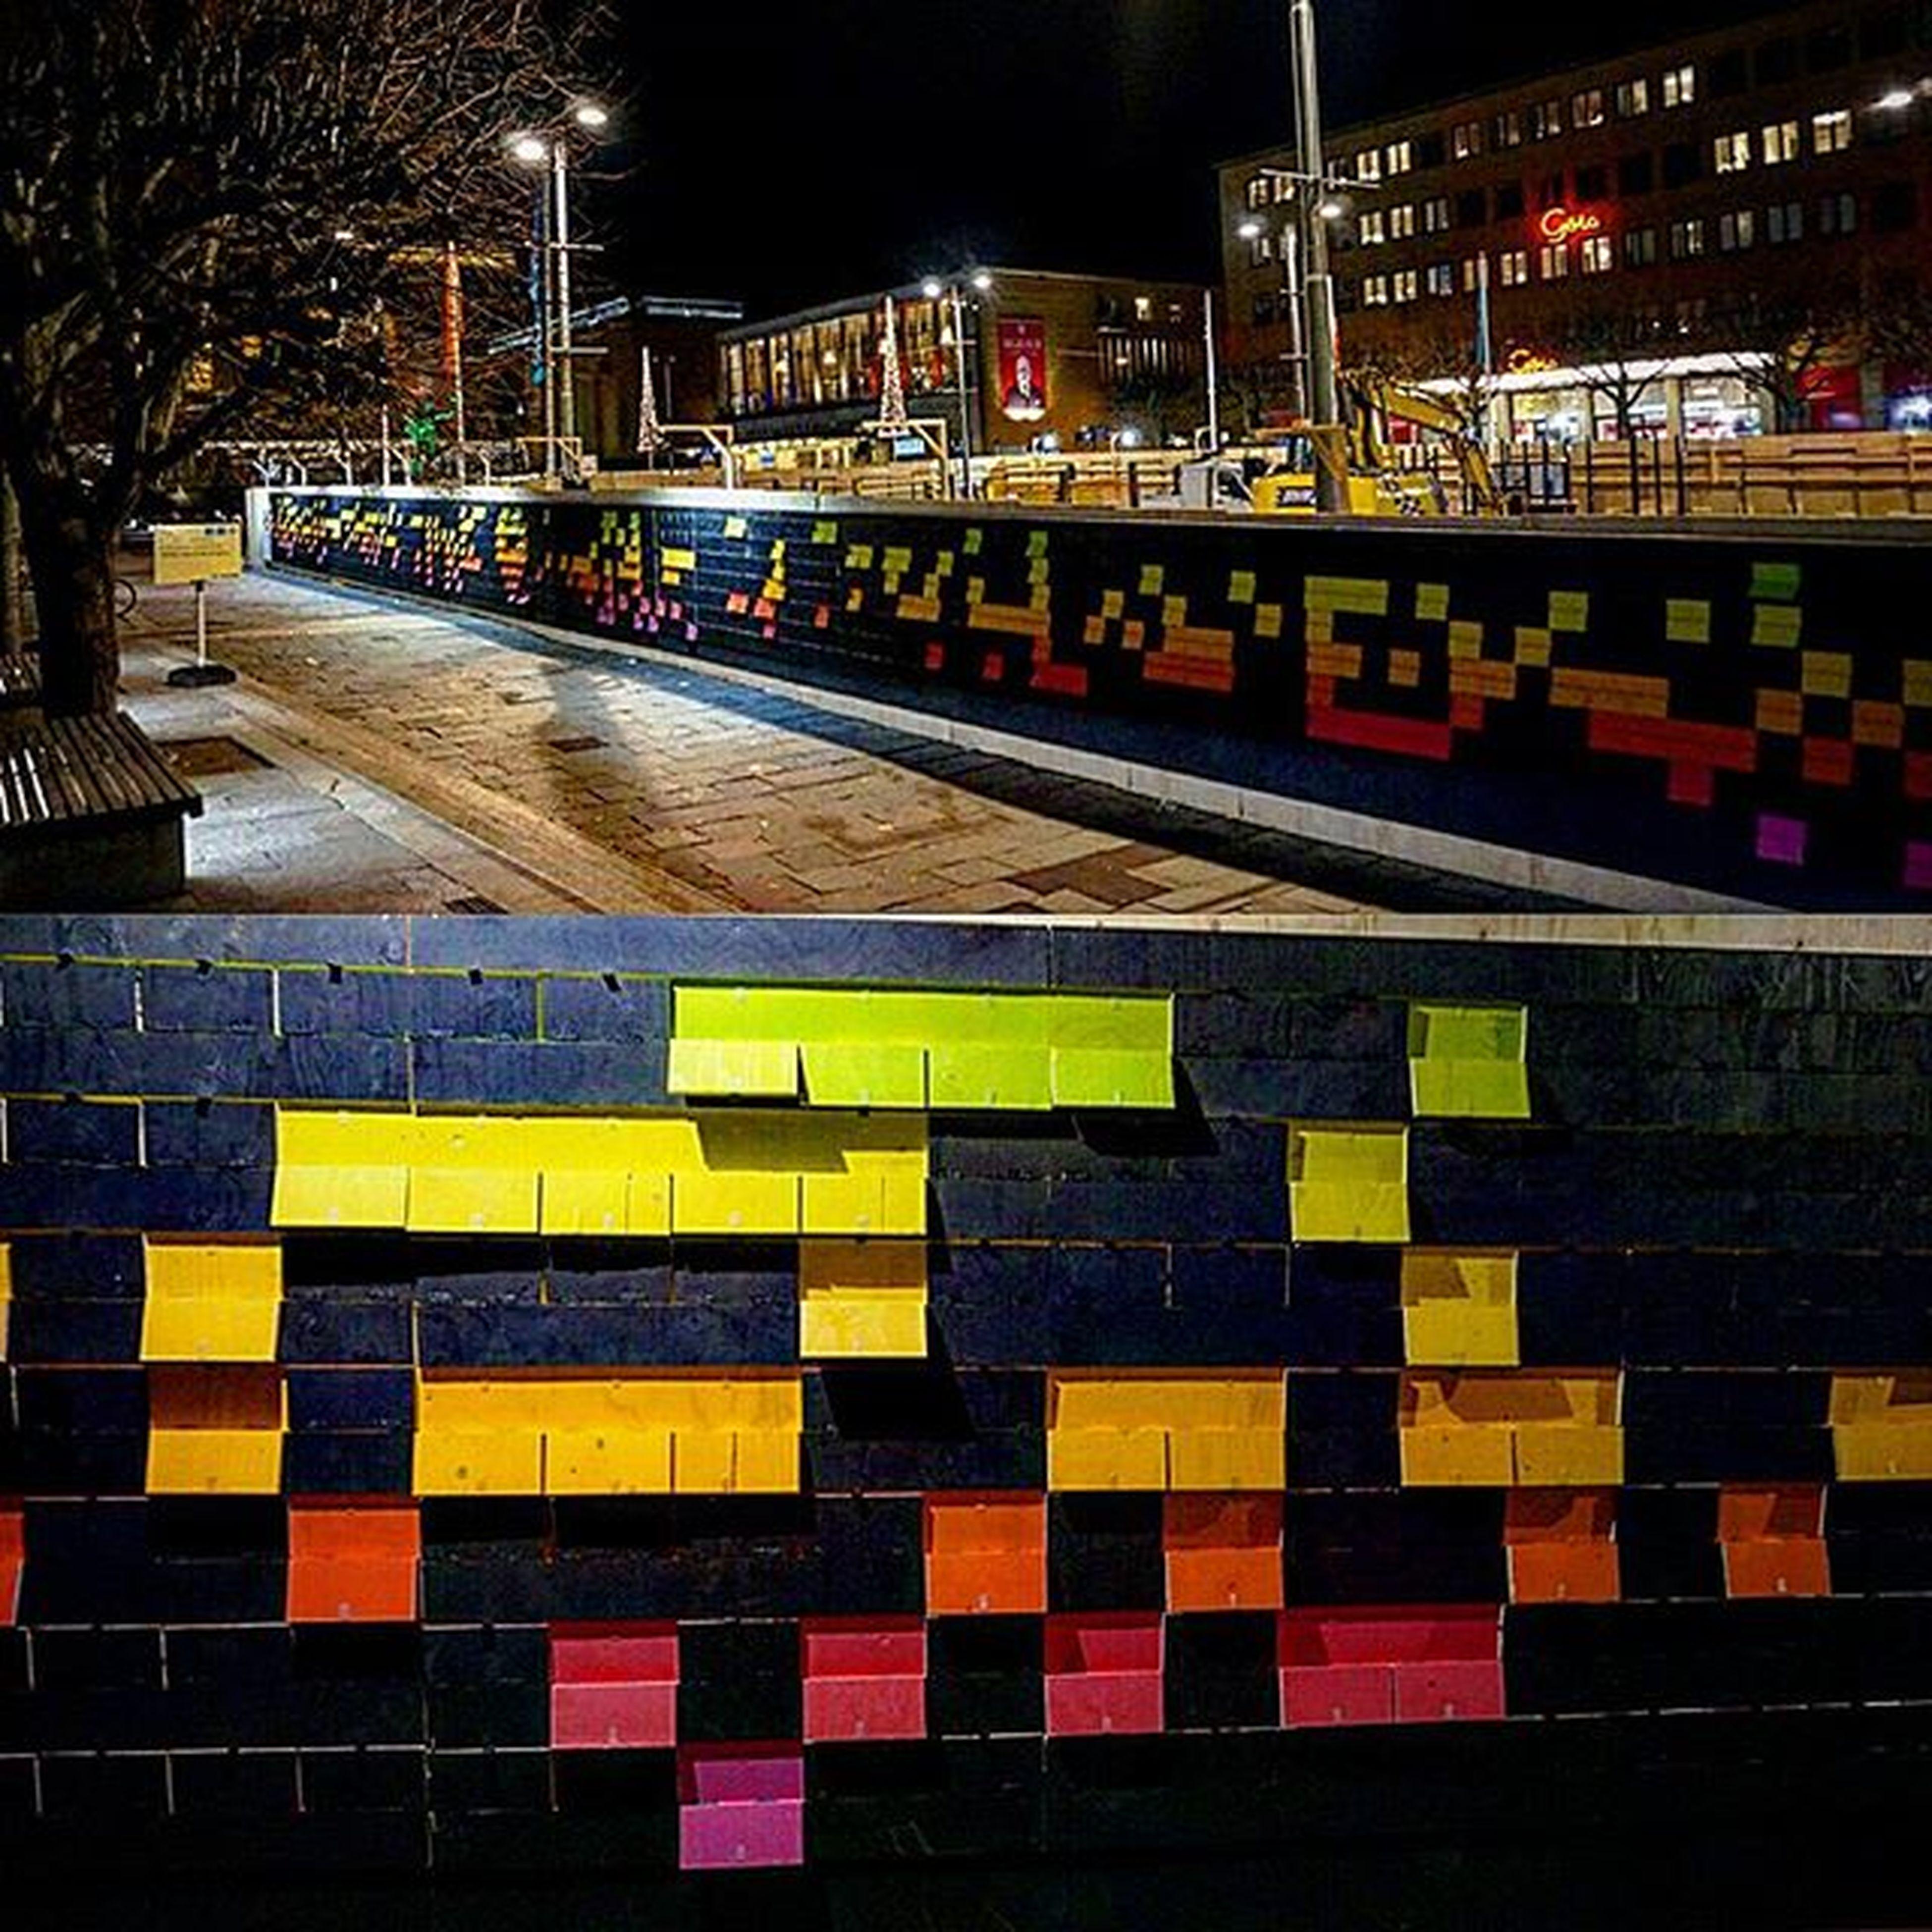 Avenyn 📷 Avenyn Poseidon Rutor Skriva Kärlek Goteborg Olikafarger City Gothenburg Sweden Progress